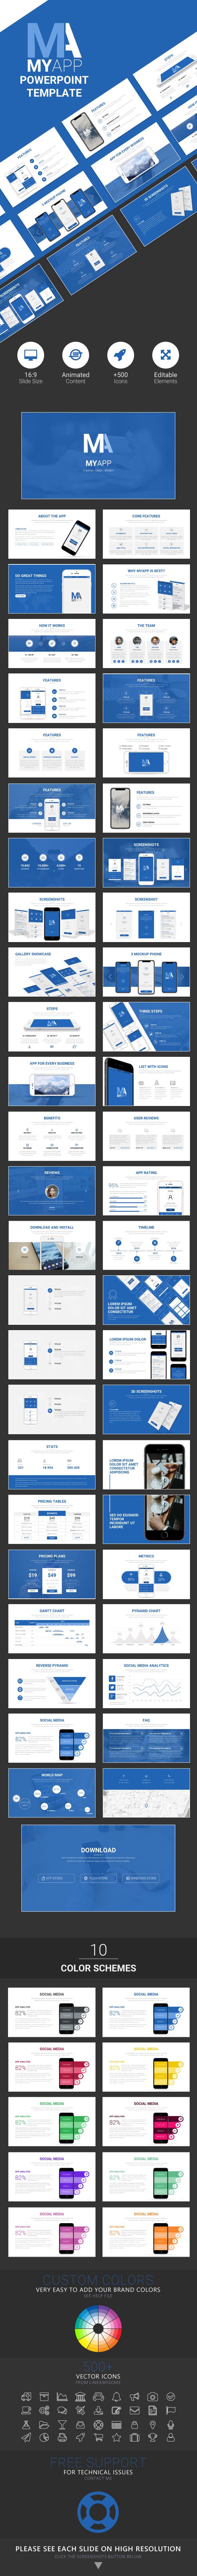 MyApp Powerpoint Template - Business PowerPoint Templates